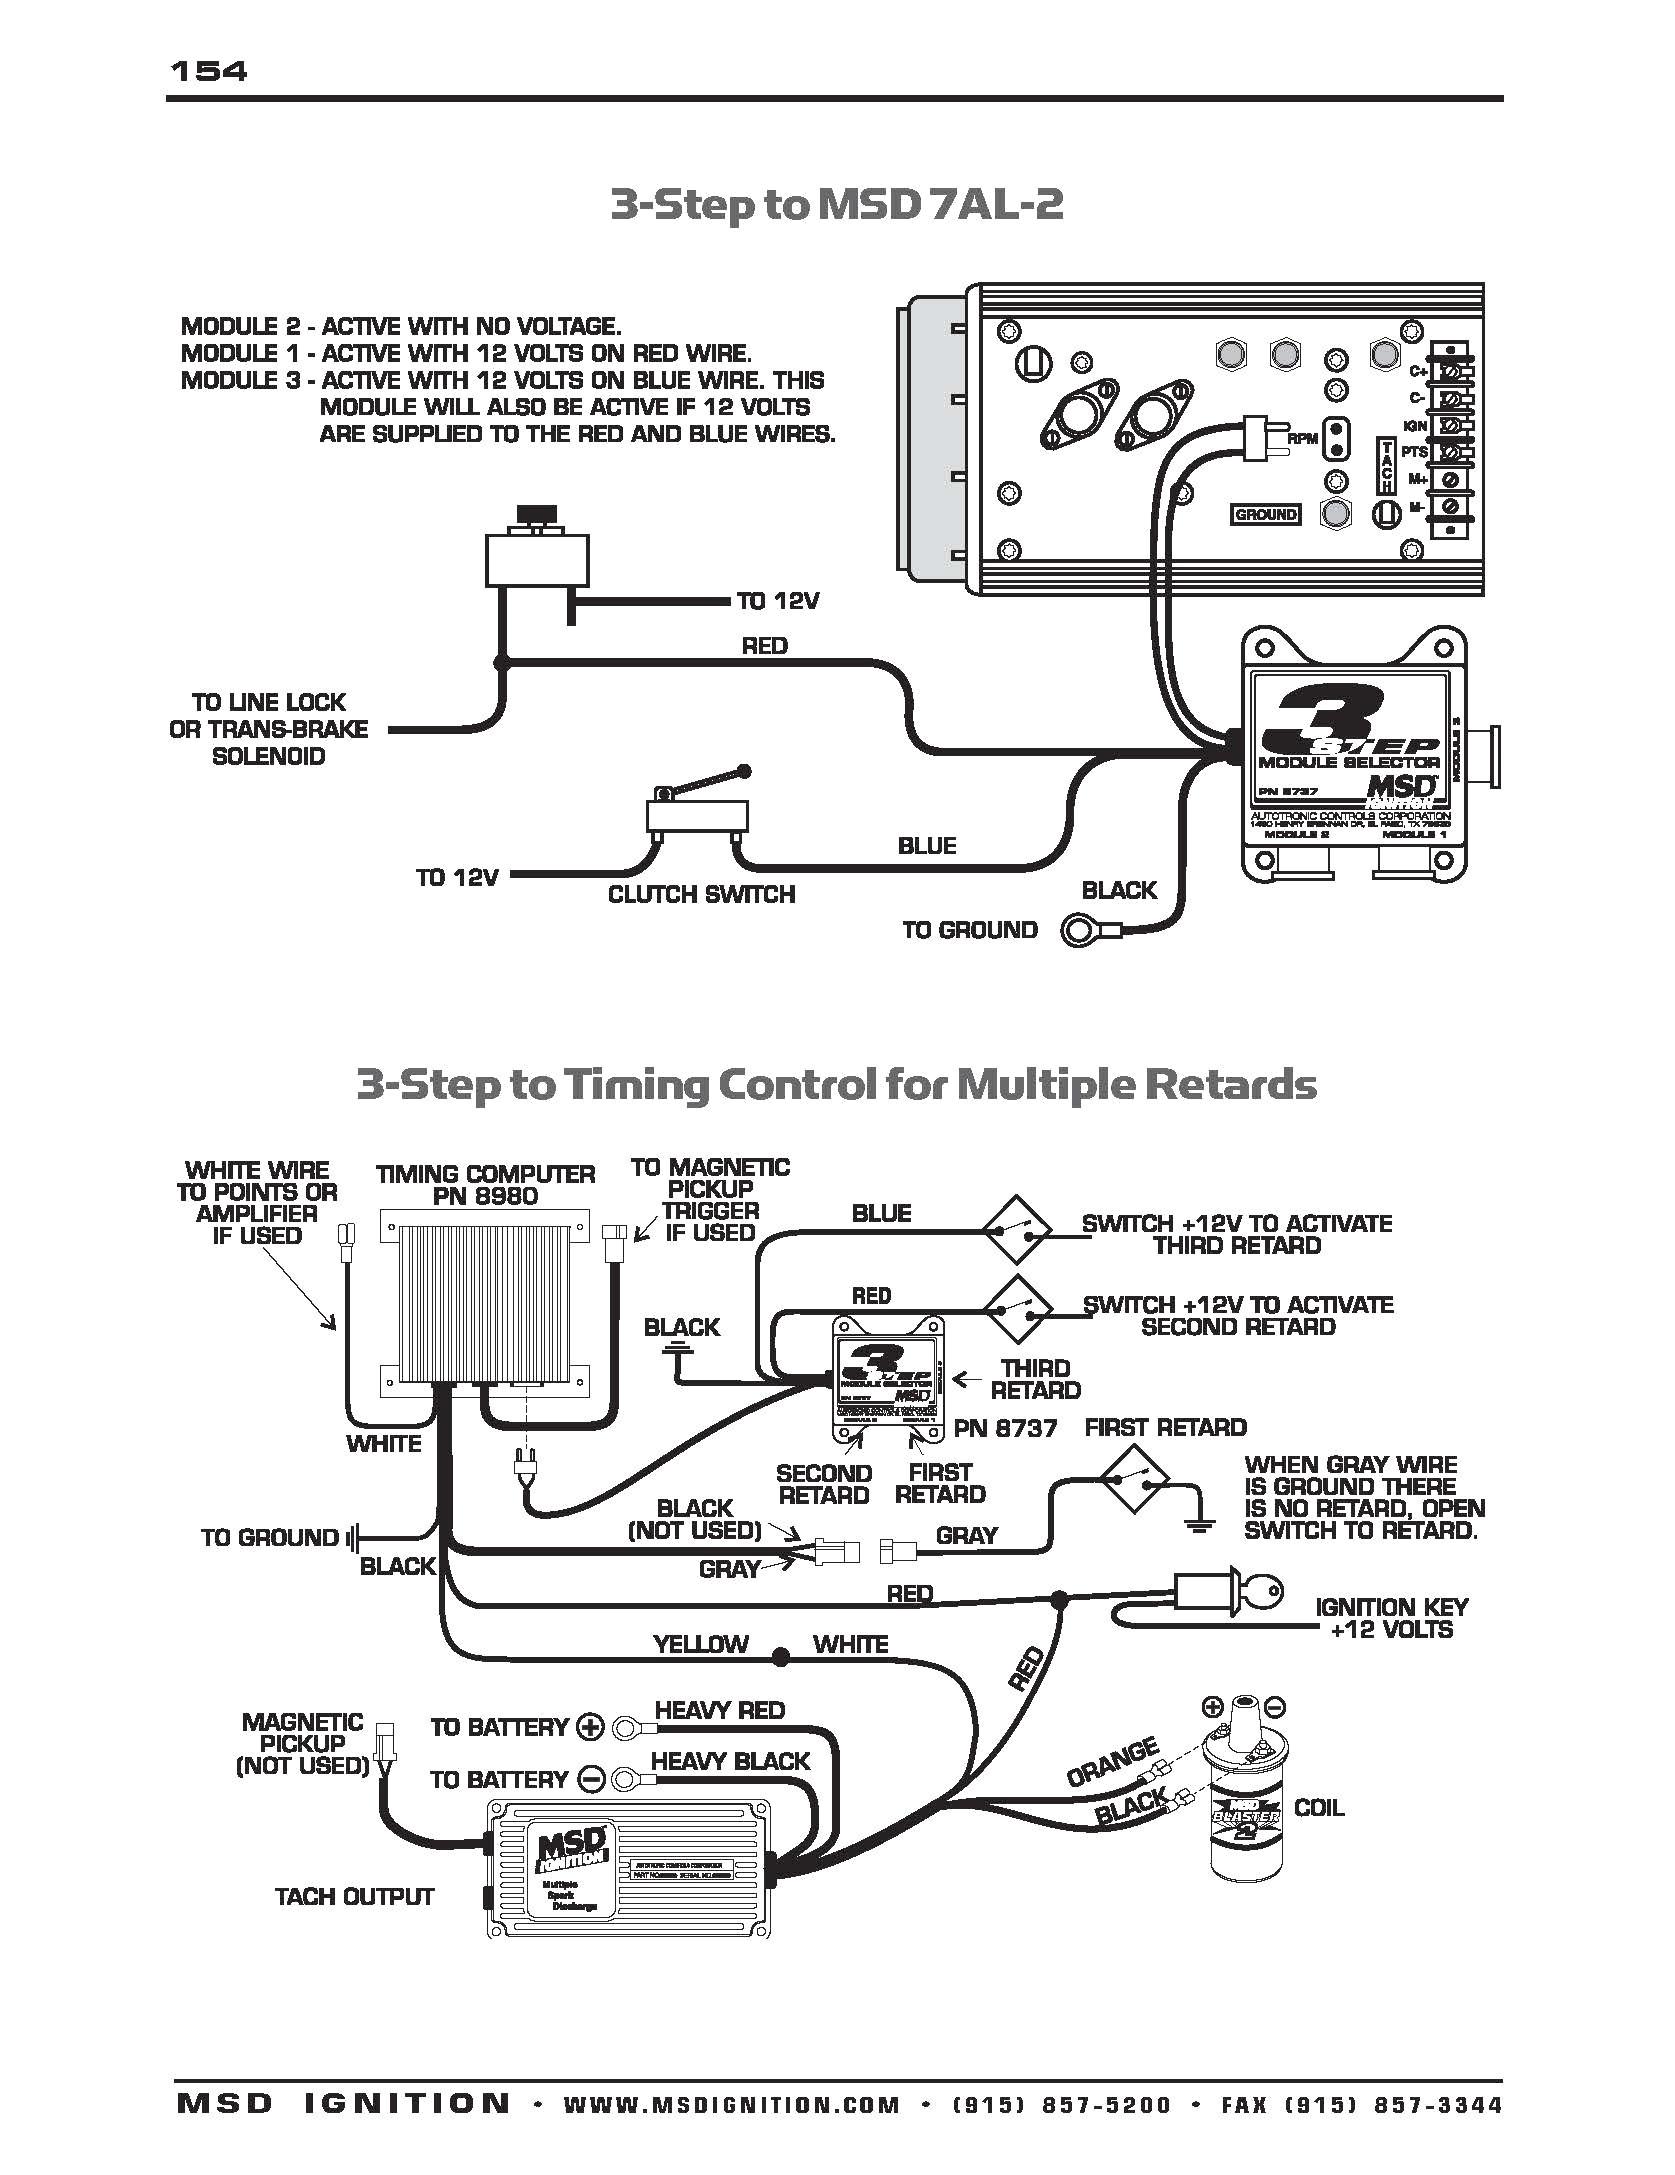 Msd Timing Control Wiring Diagram Msd 6t Wiring Diagram Wiring Diagram Technic